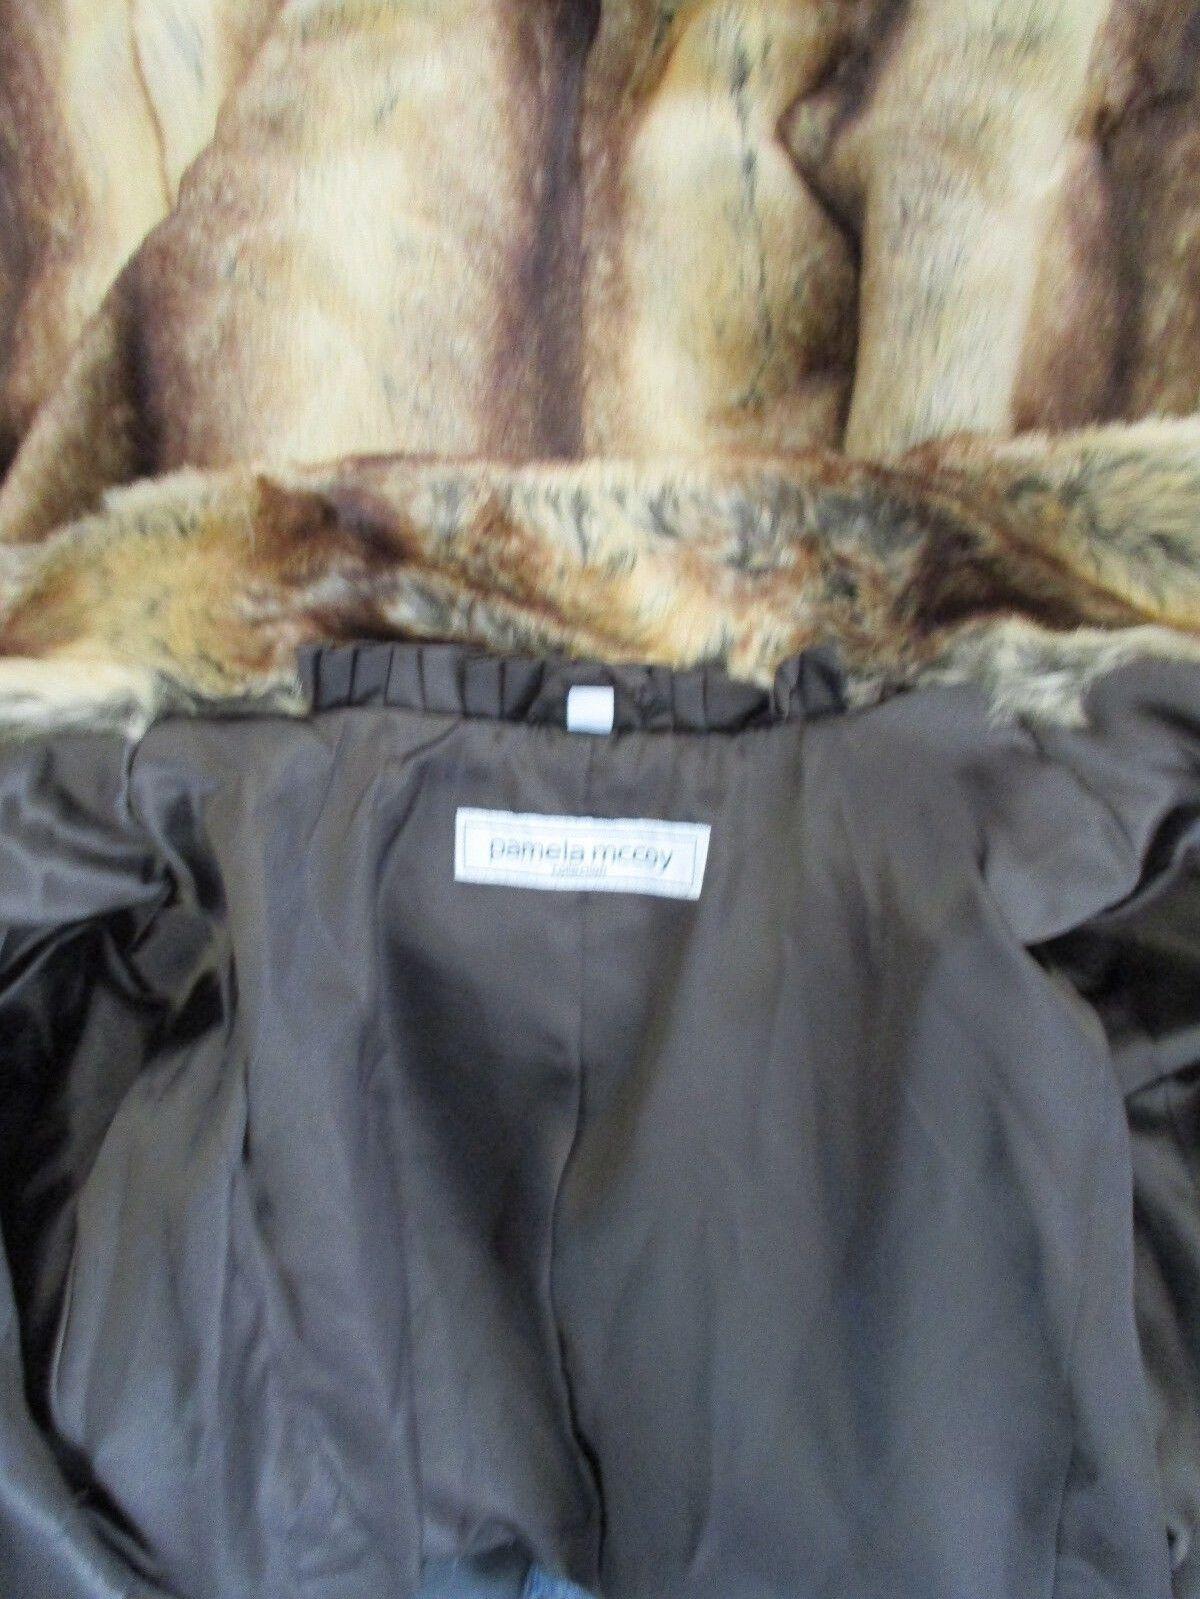 PAMELA MCCOY COLLECTION BROWN MIX FAUX LONG COAT SIZE SIZE SIZE XL - NWT 5bab75